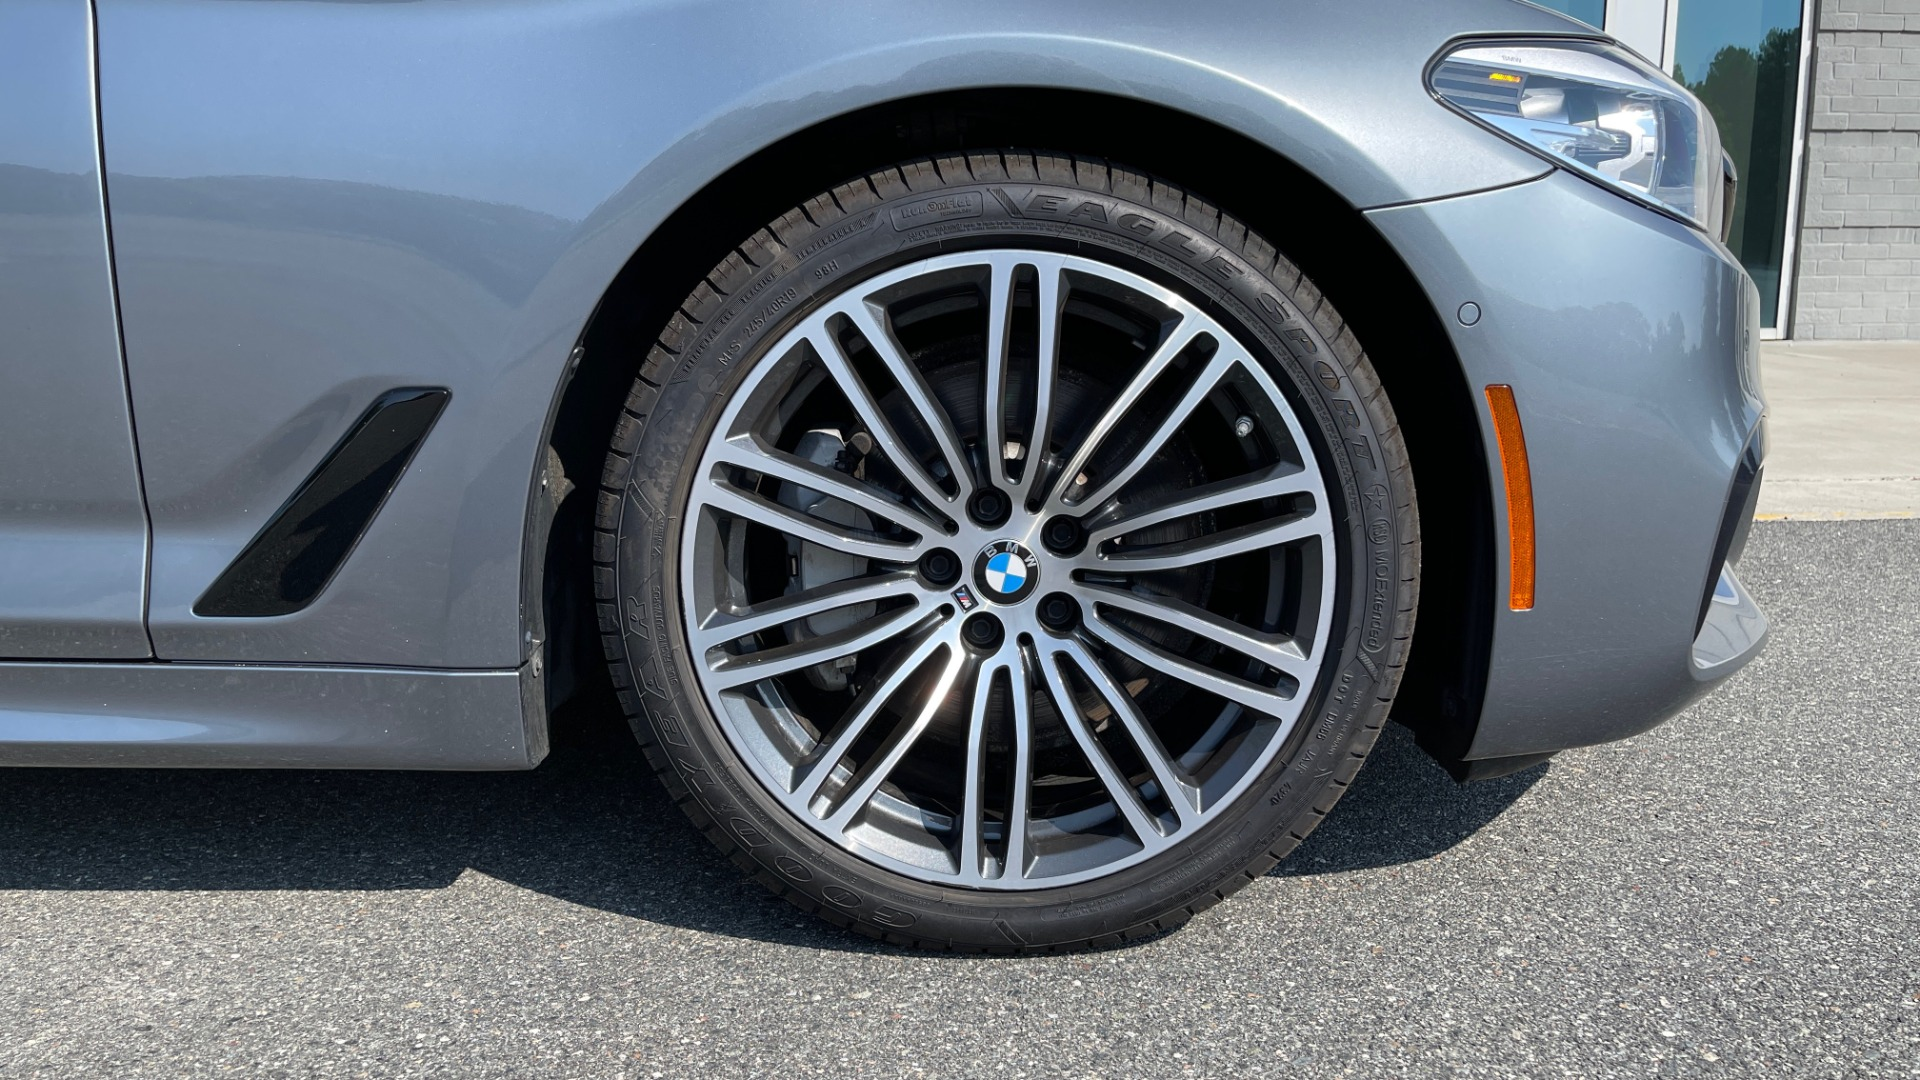 Used 2018 BMW 5 SERIES 540I XDRIVE M-SPORT / DRVR ASST / PDC / APPLE / HUD / H/K SND for sale $42,795 at Formula Imports in Charlotte NC 28227 72